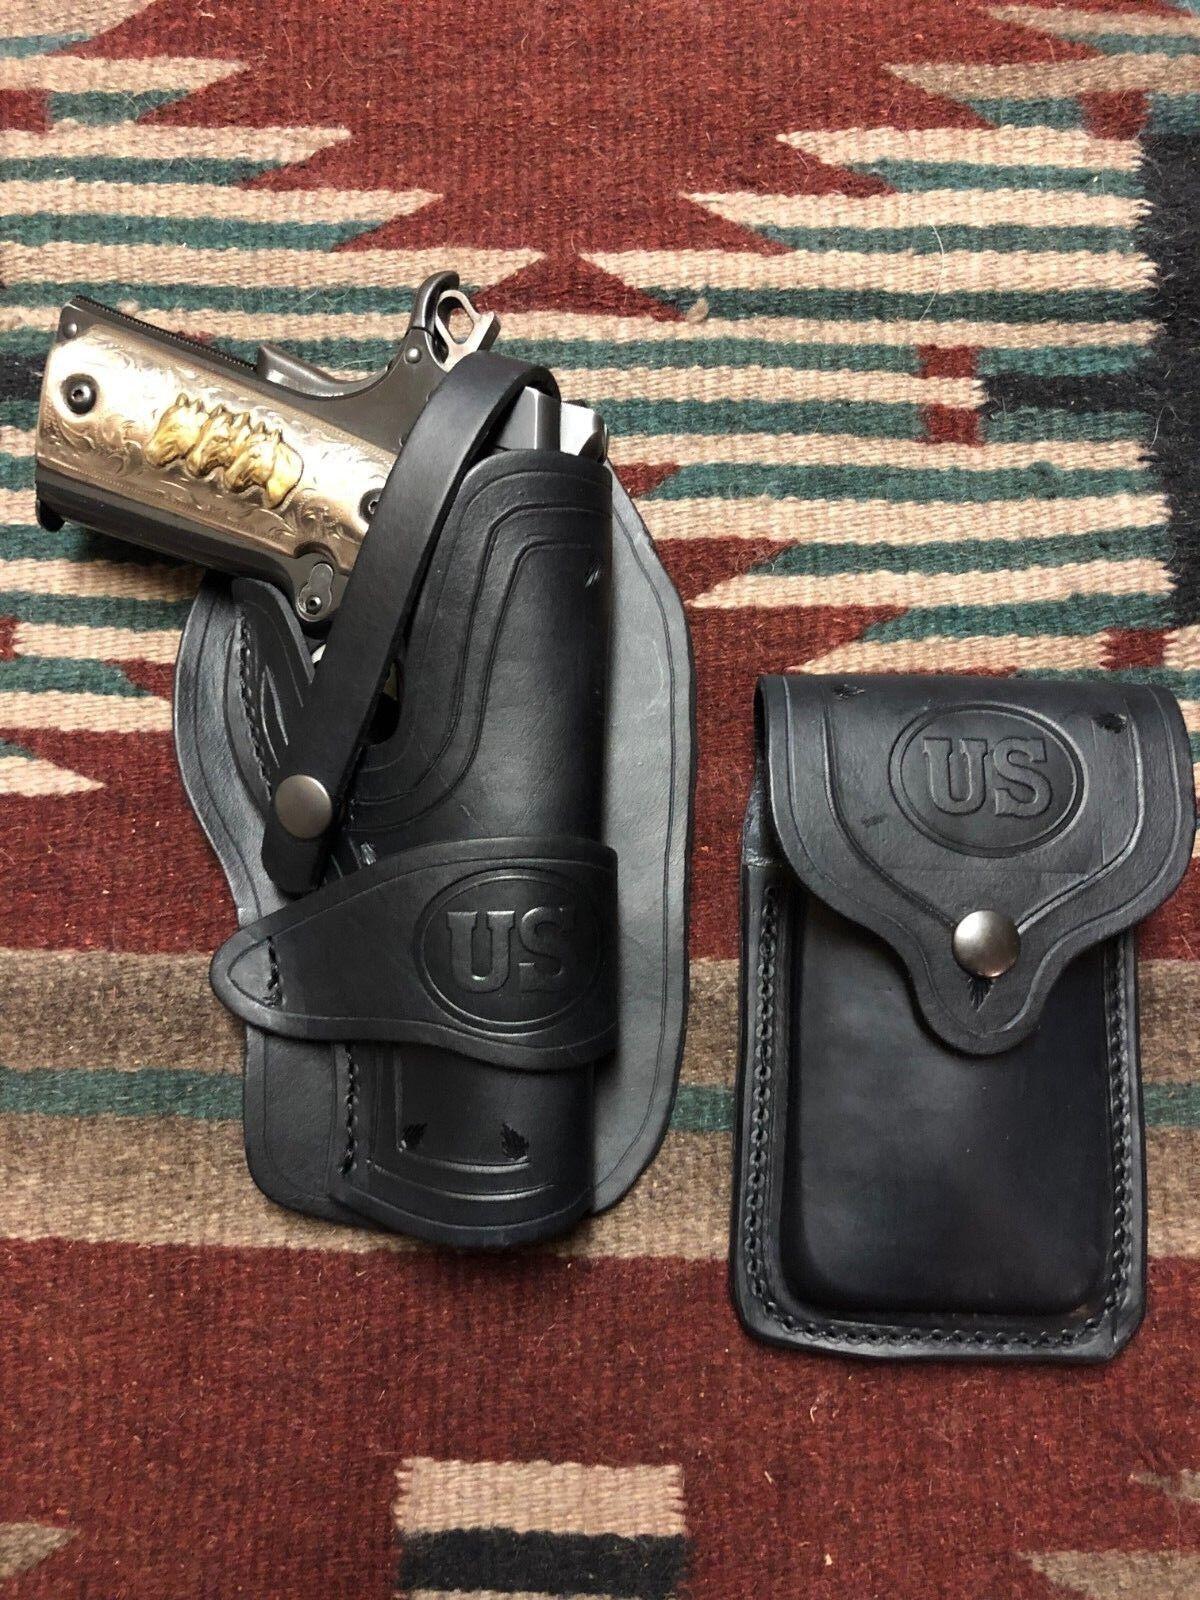 Se adapta a Colt 45 Modelo 1911 Negro Cuero Funda & Bolsa Wild Bunch estilo revista